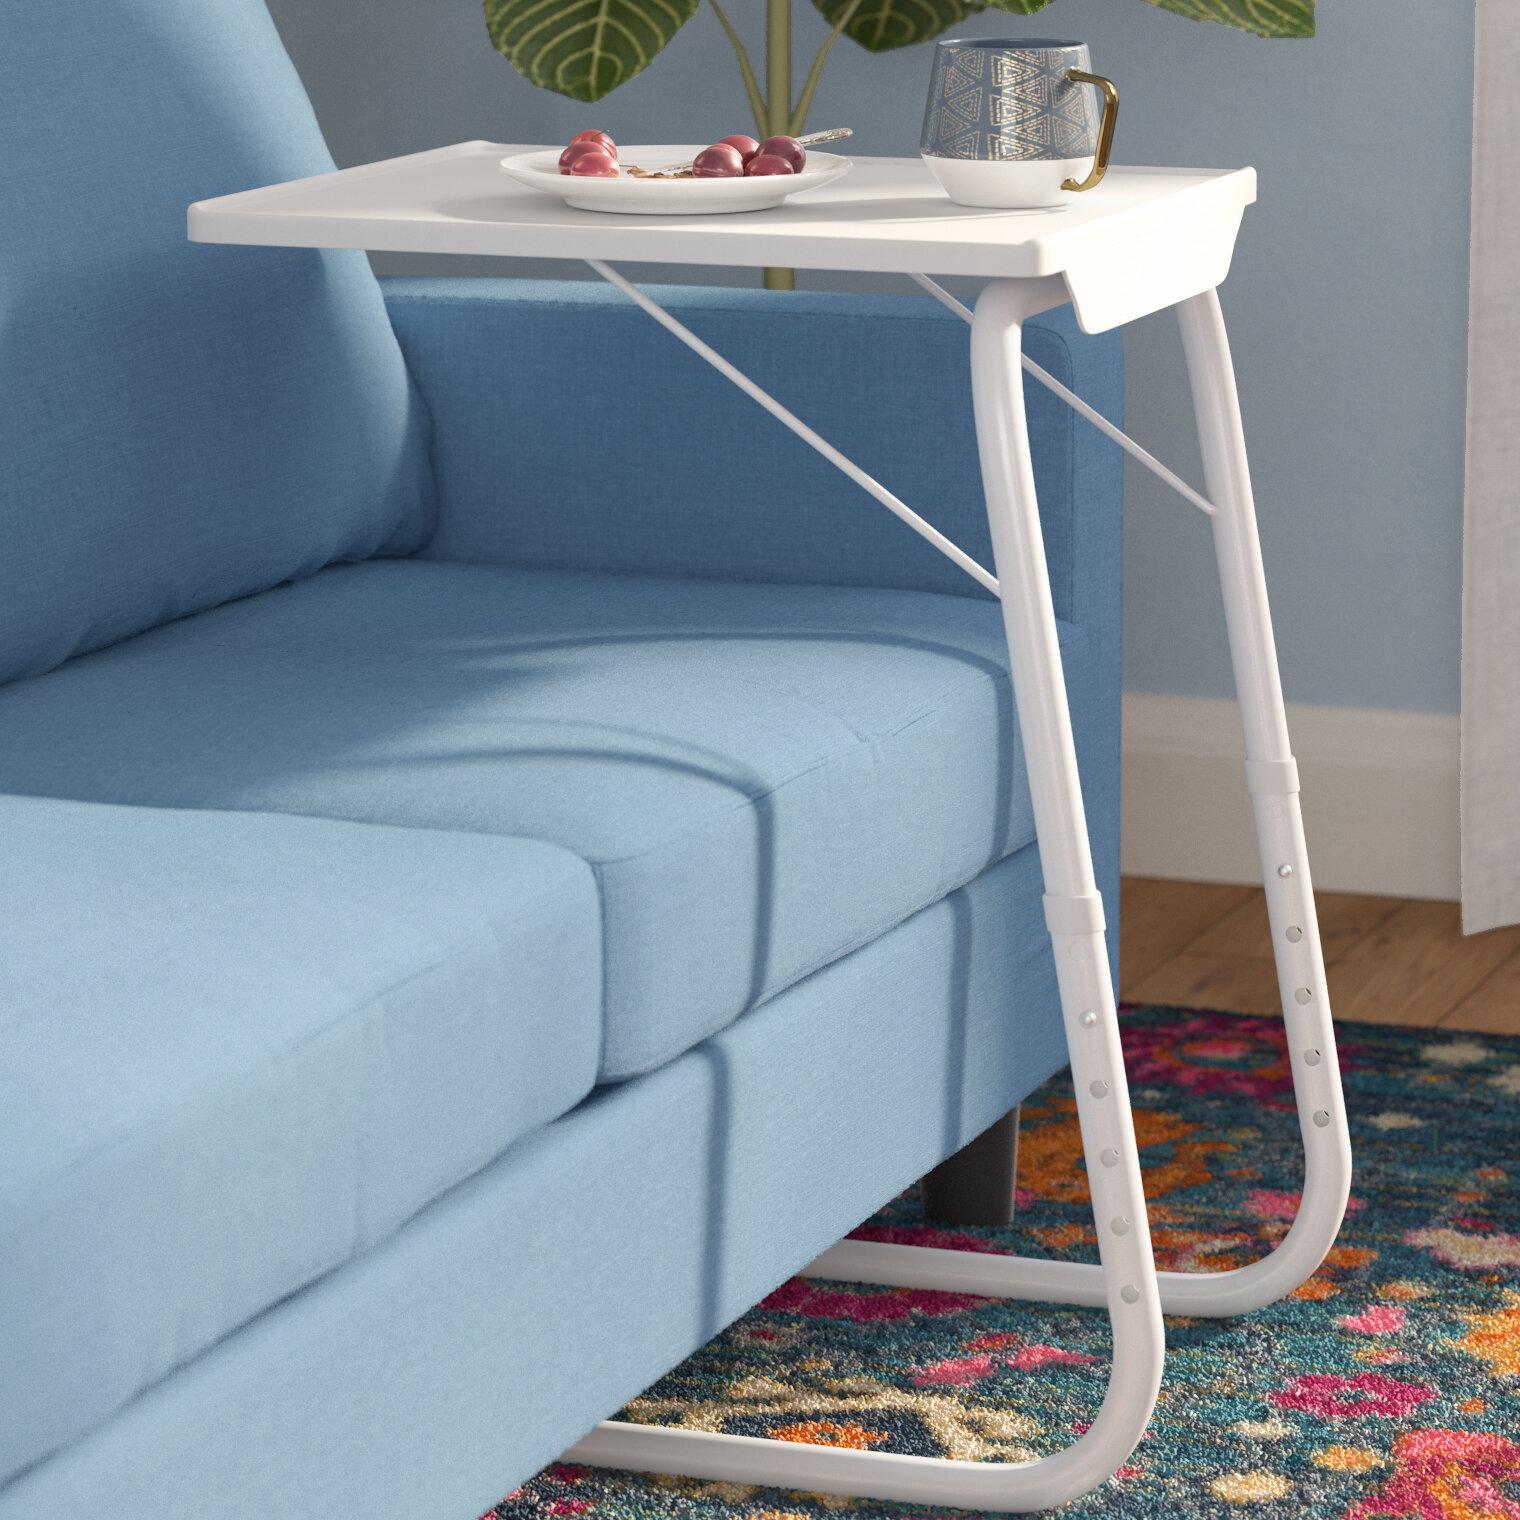 Ebern Designs Hughes Foldable Table & Reviews | Wayfair